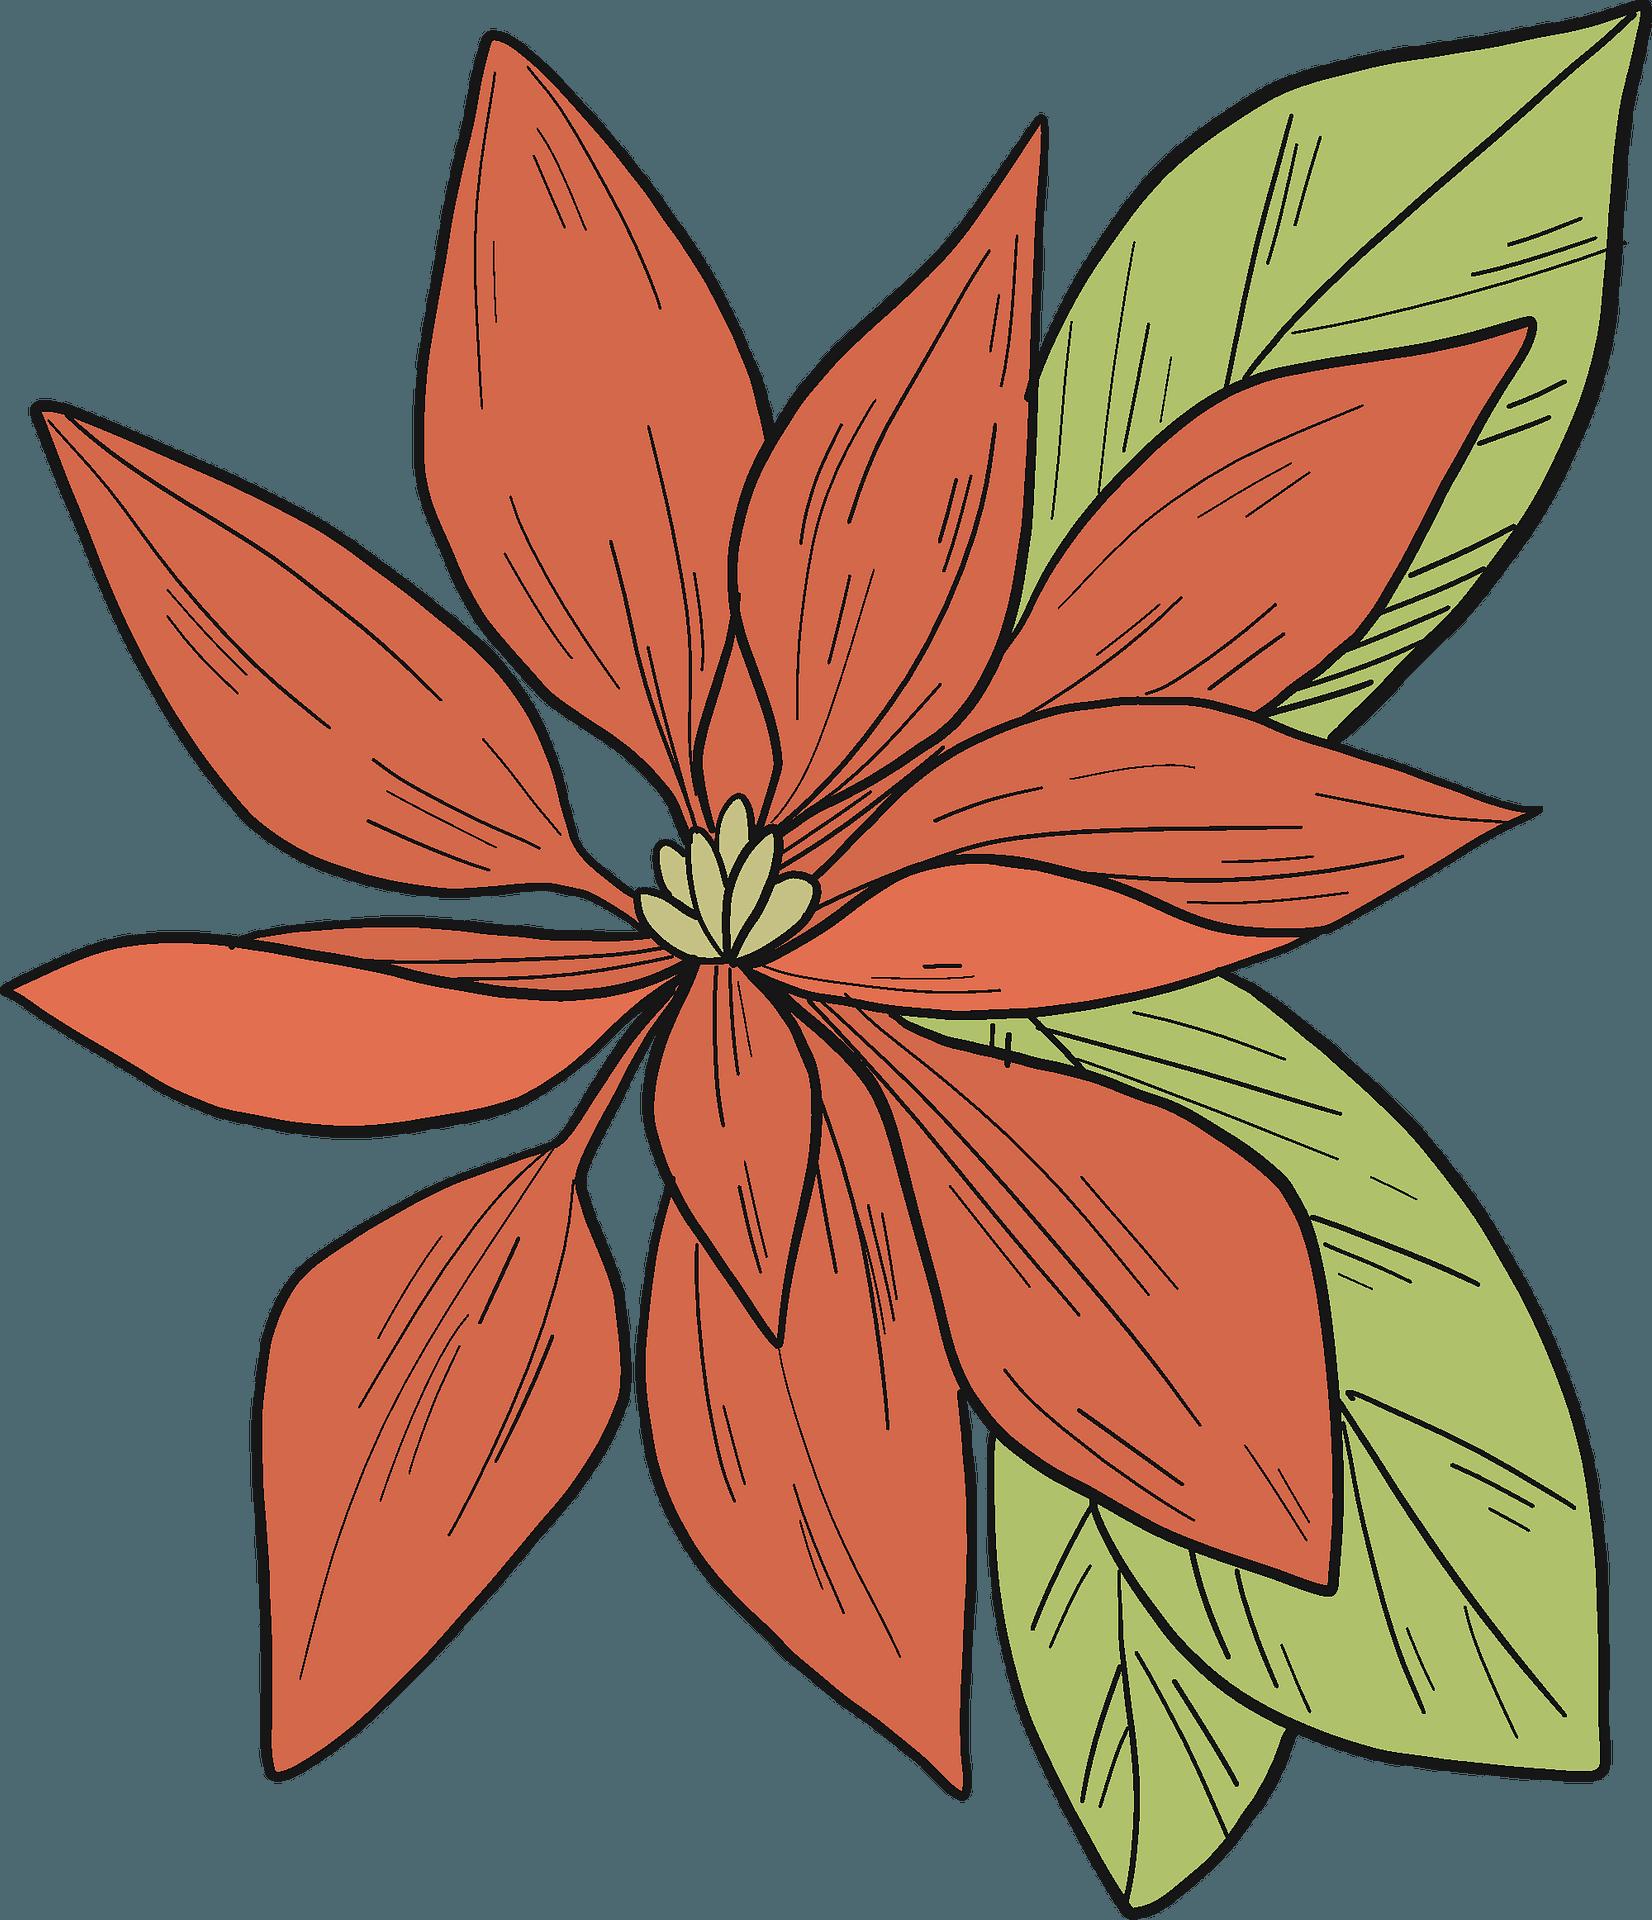 Christmas Poinsettia Clipart png download - 600*581 - Free Transparent  Santa Claus png Download. - CleanPNG / KissPNG